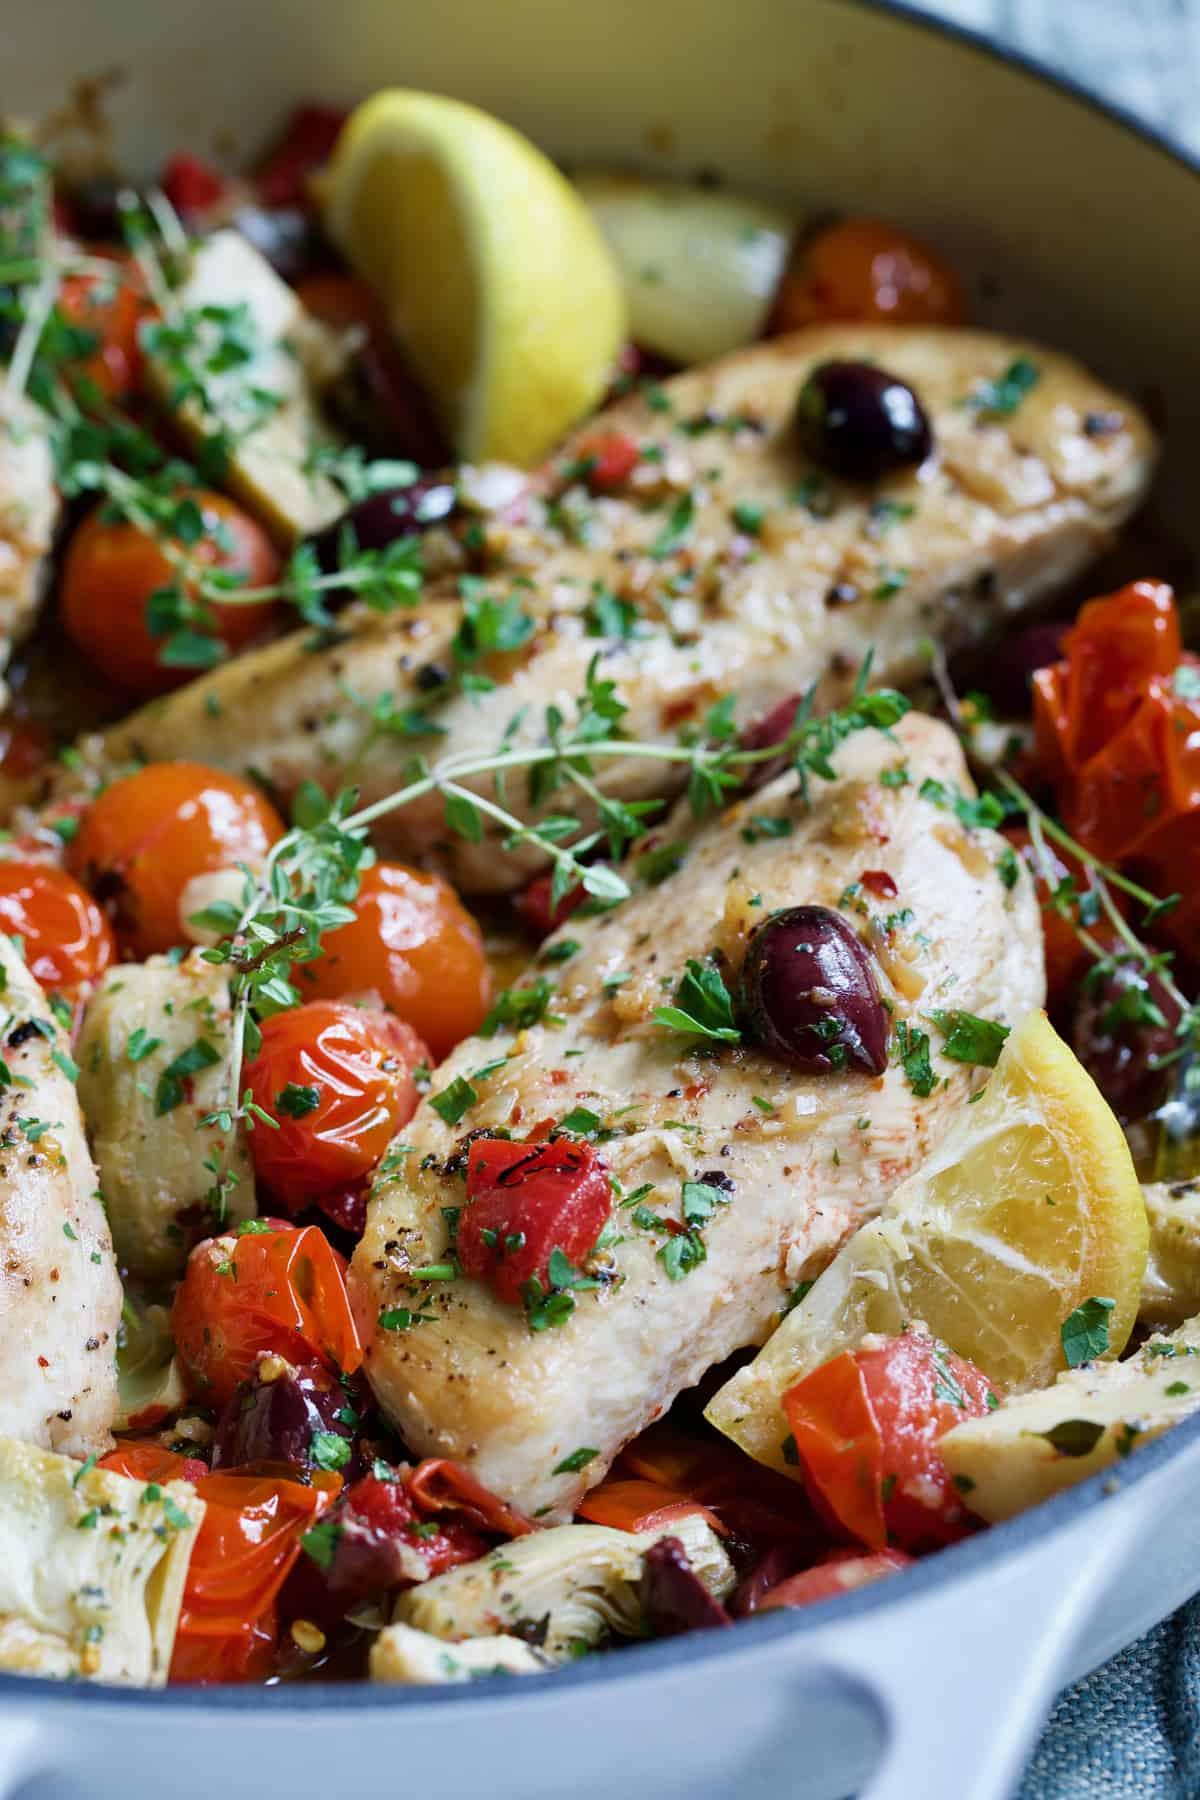 Two of the chicken breasts in Easy Skillet Mediterranean Chicken.